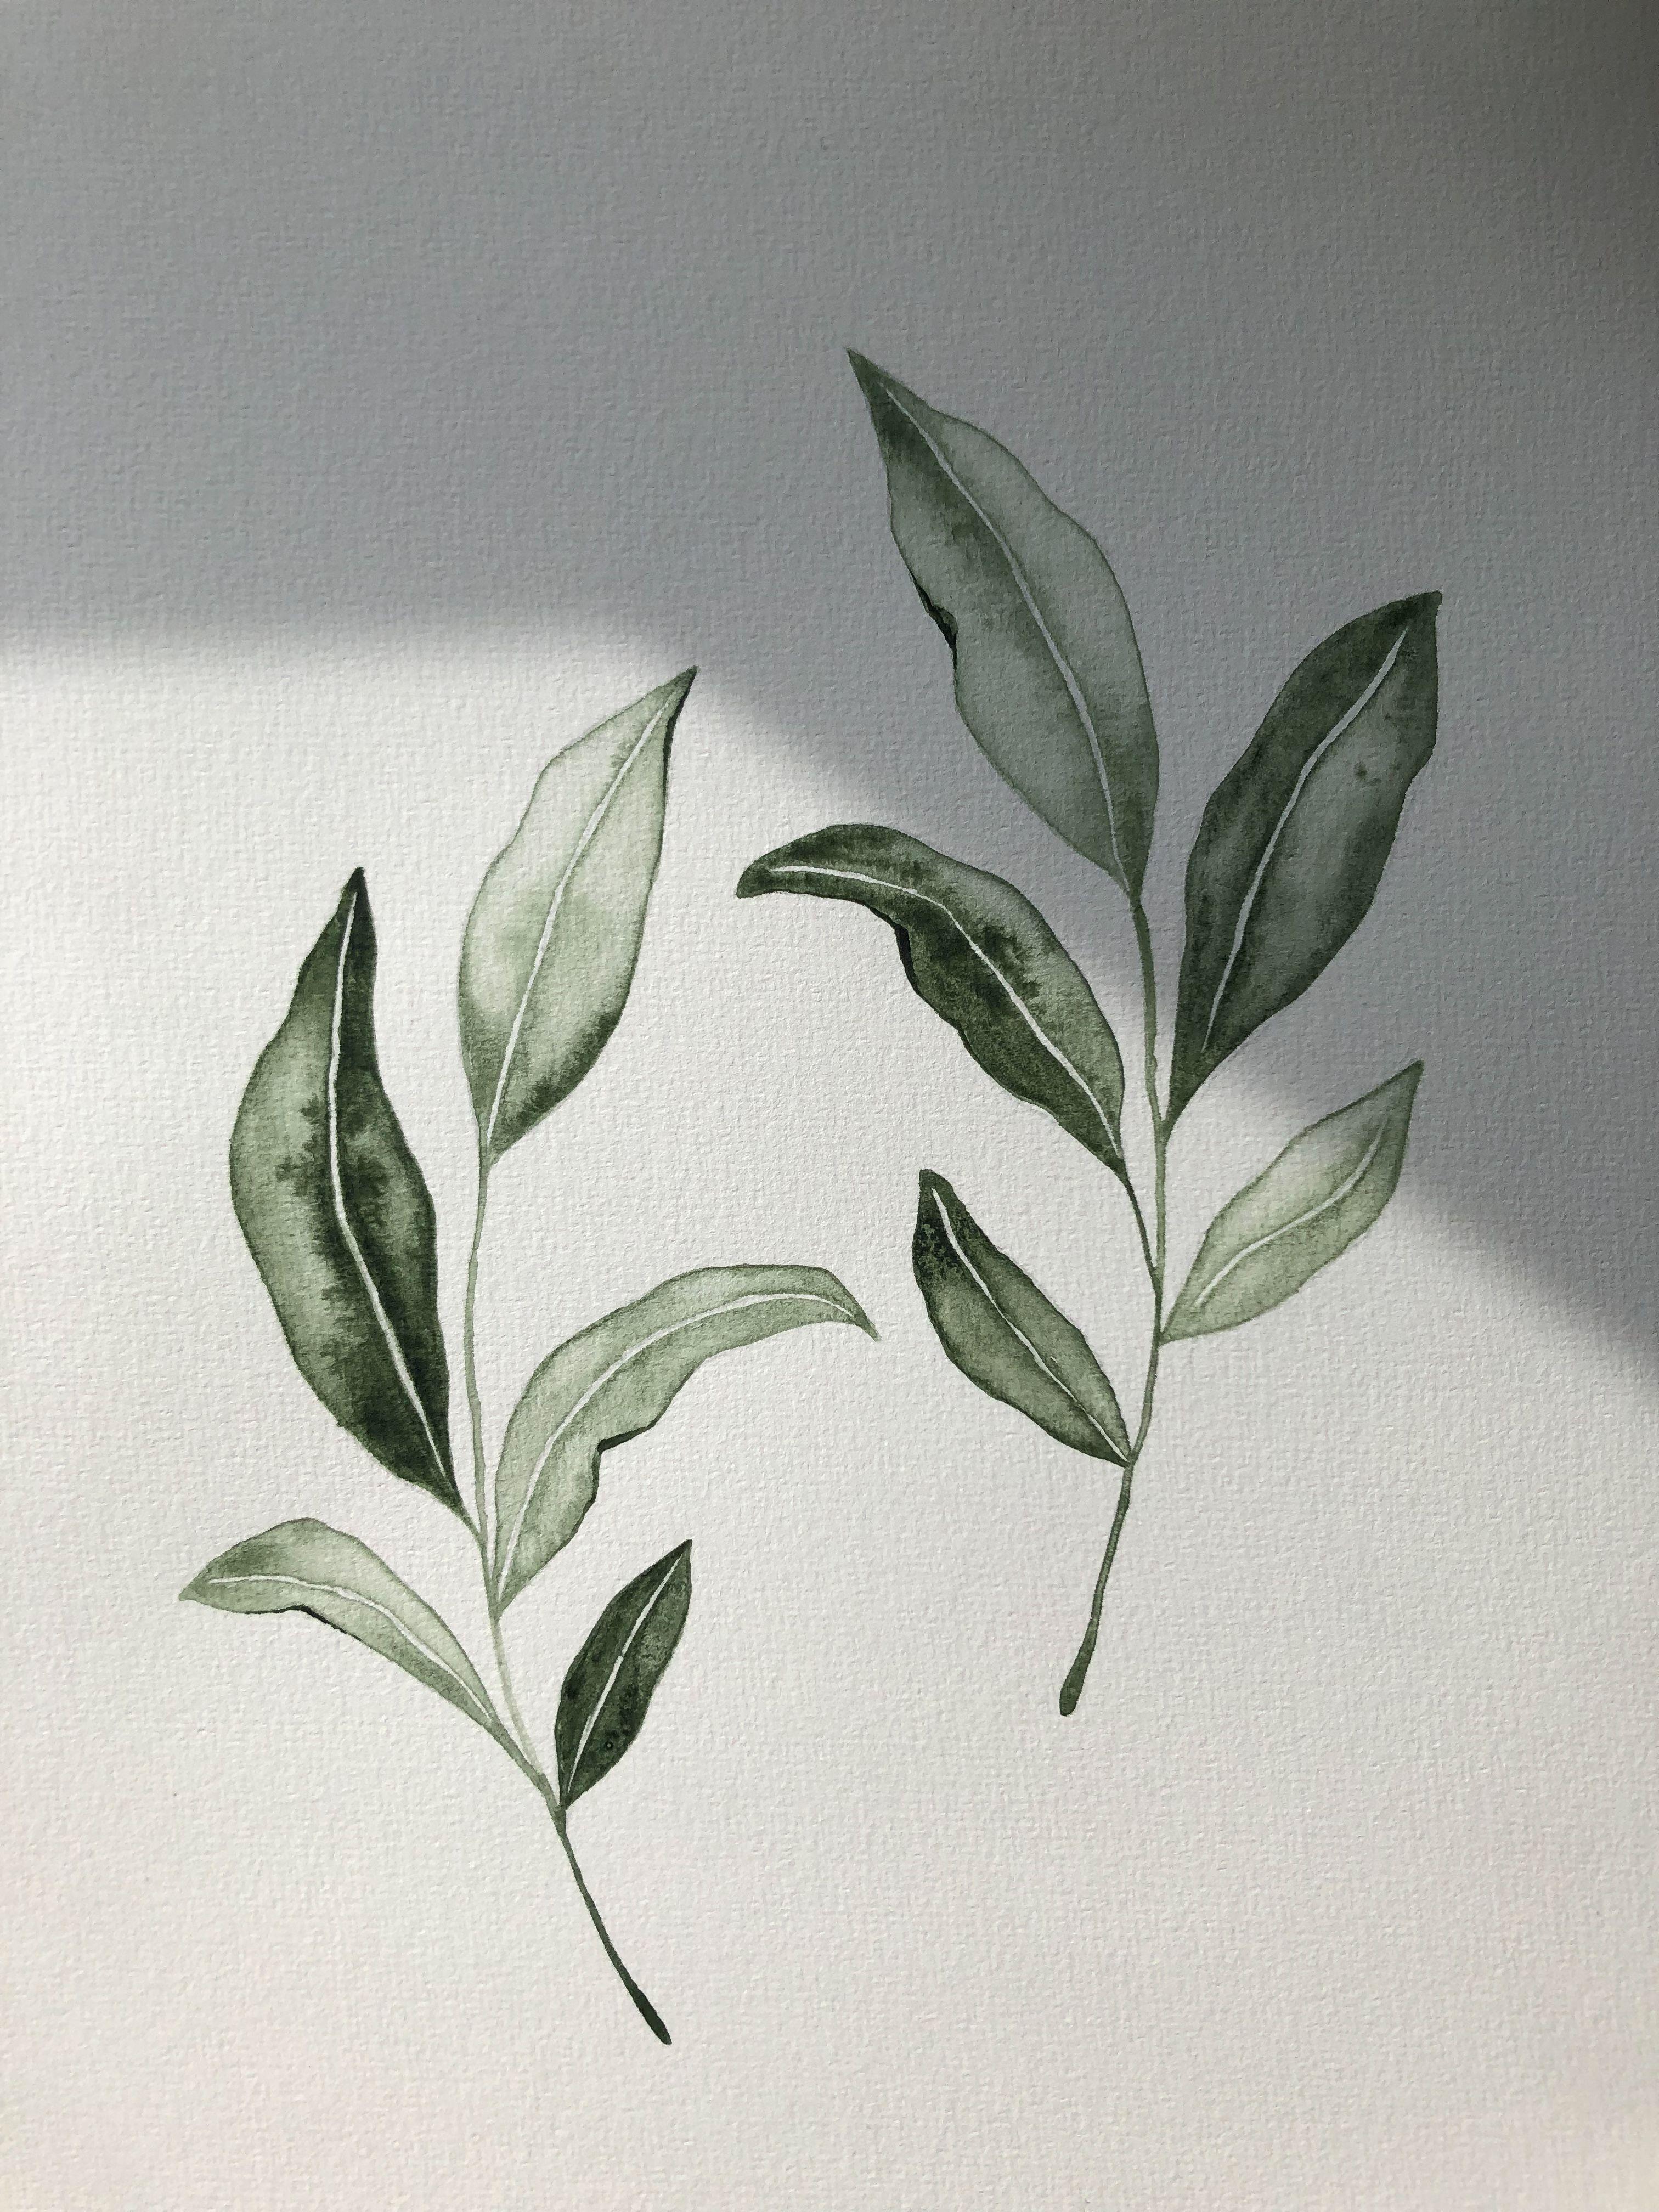 A watercolor piece by Skyla Design #watercolors #greenery #branch